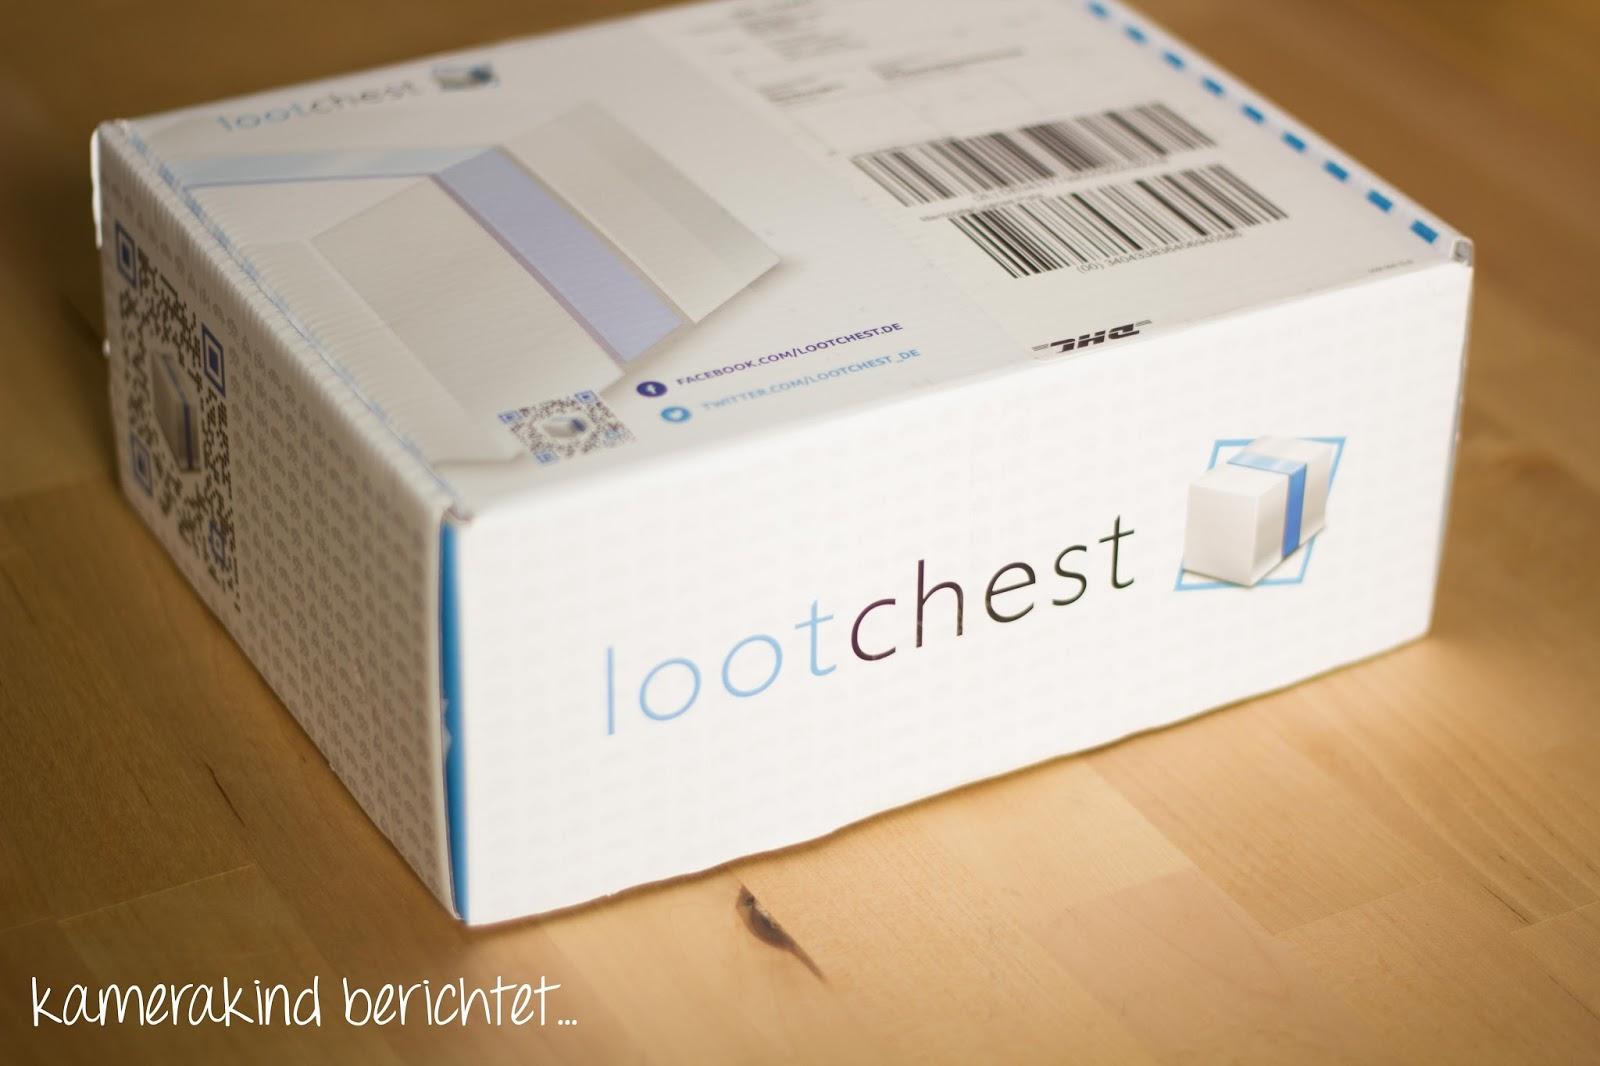 Lootchest Unboxing Februar 2015